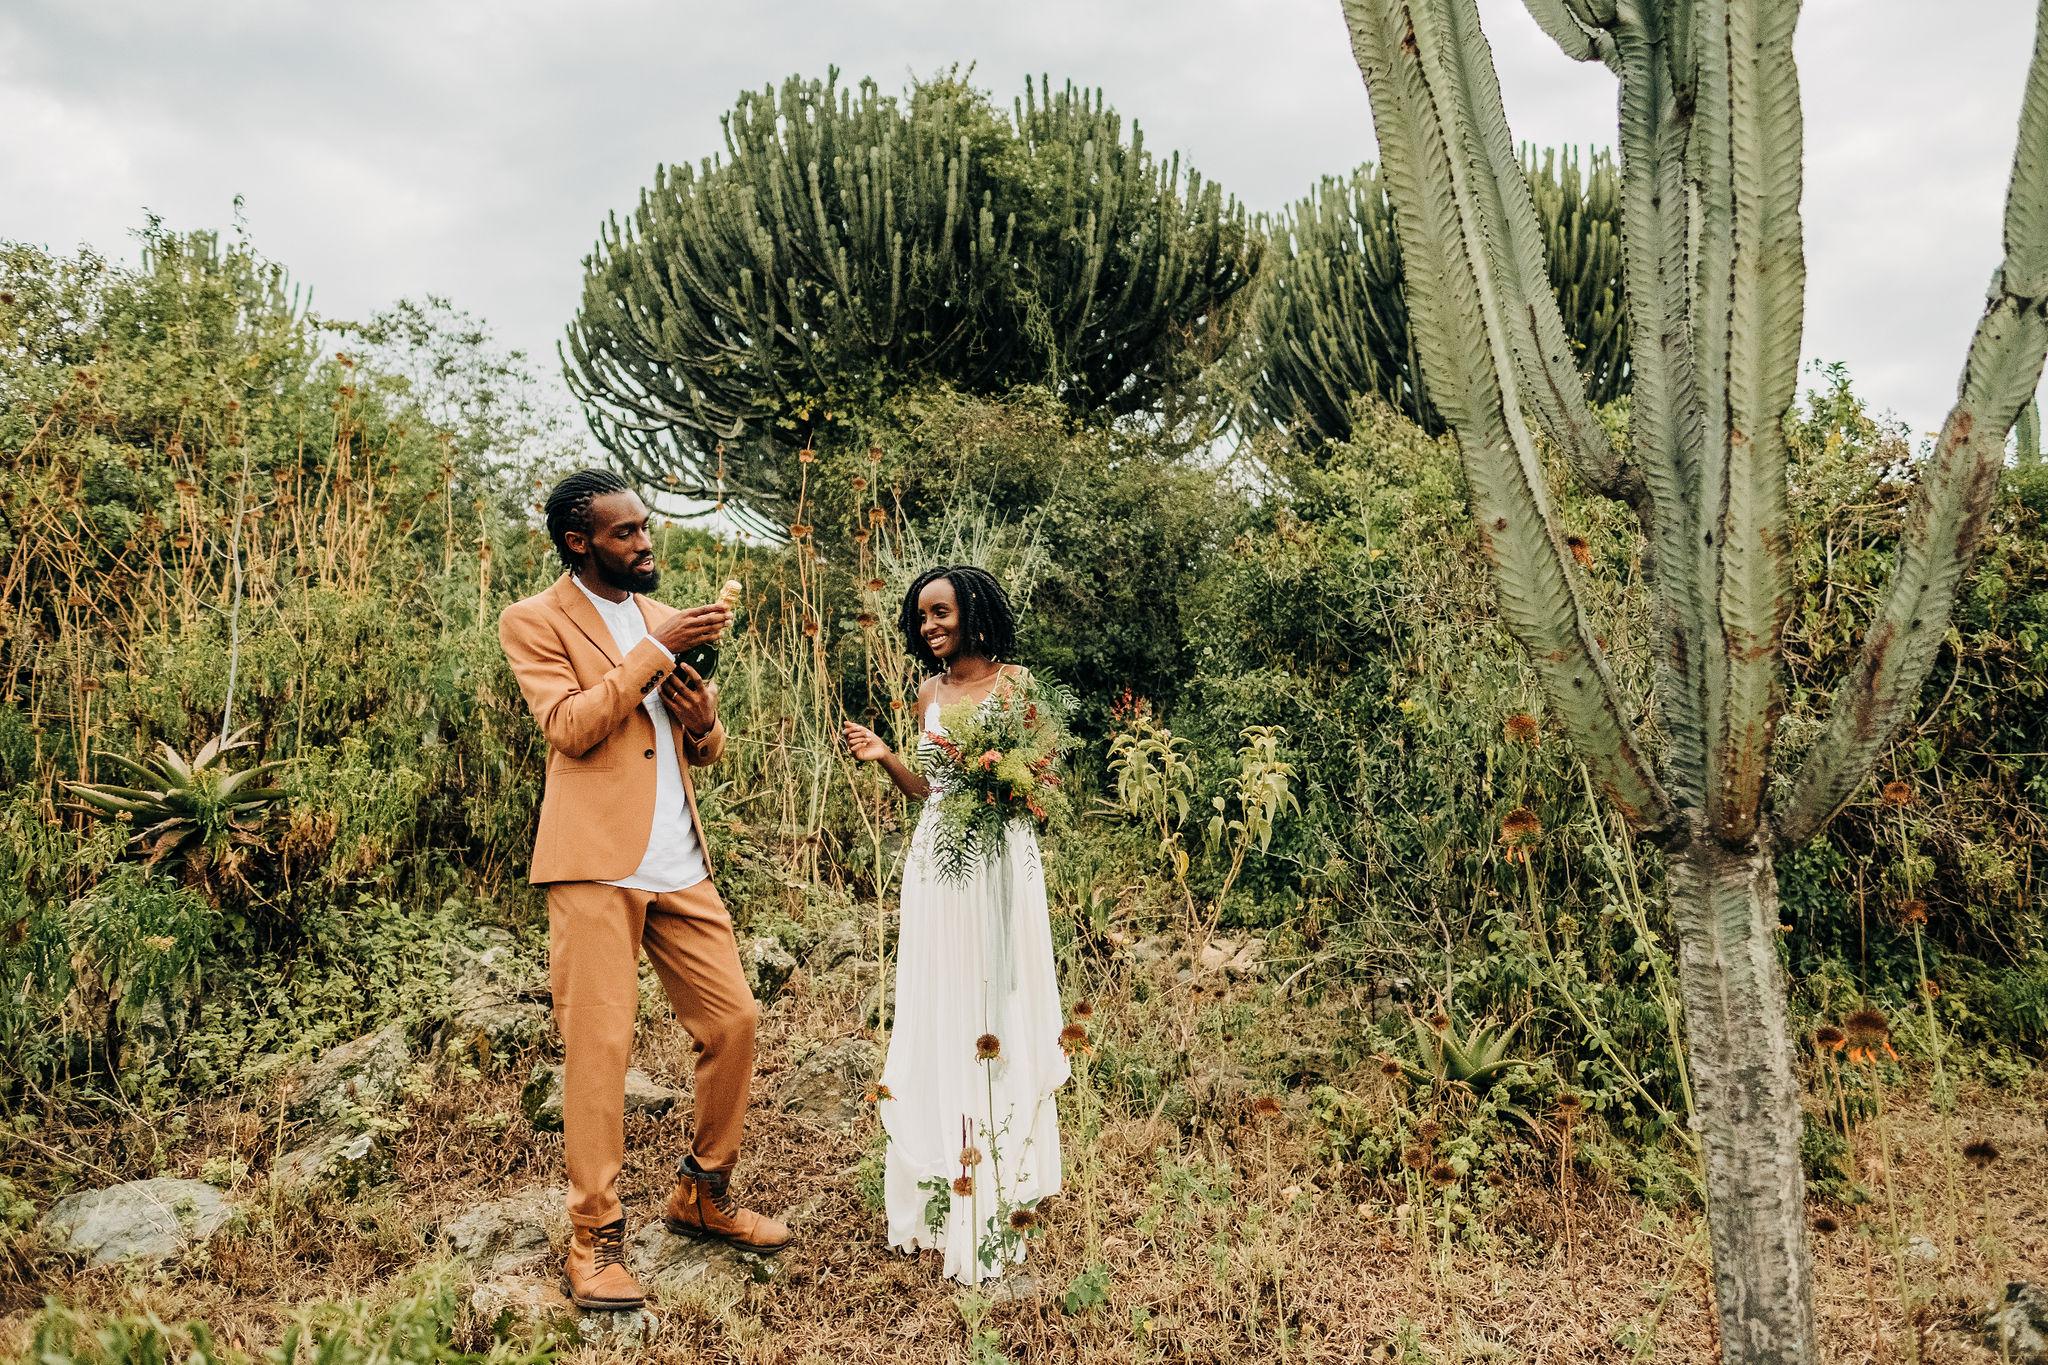 Anna-Hari-Photography-Destination-Wedding-Photographer-Kenya-206.jpg